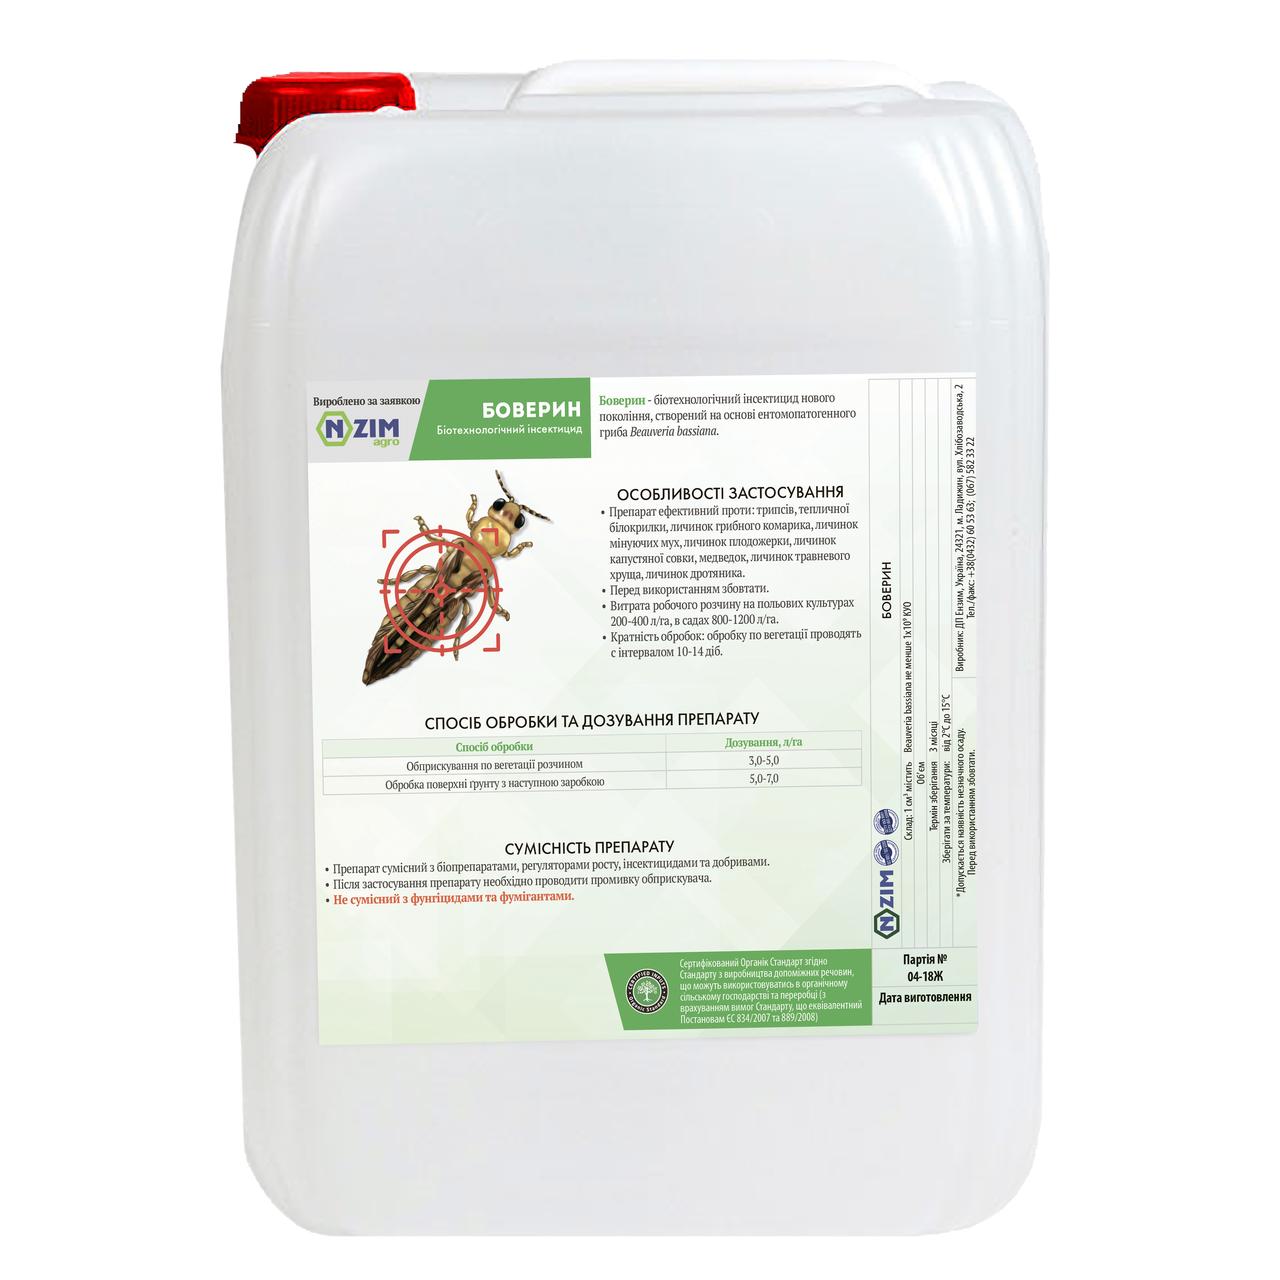 Биологический инсектицид Боверин